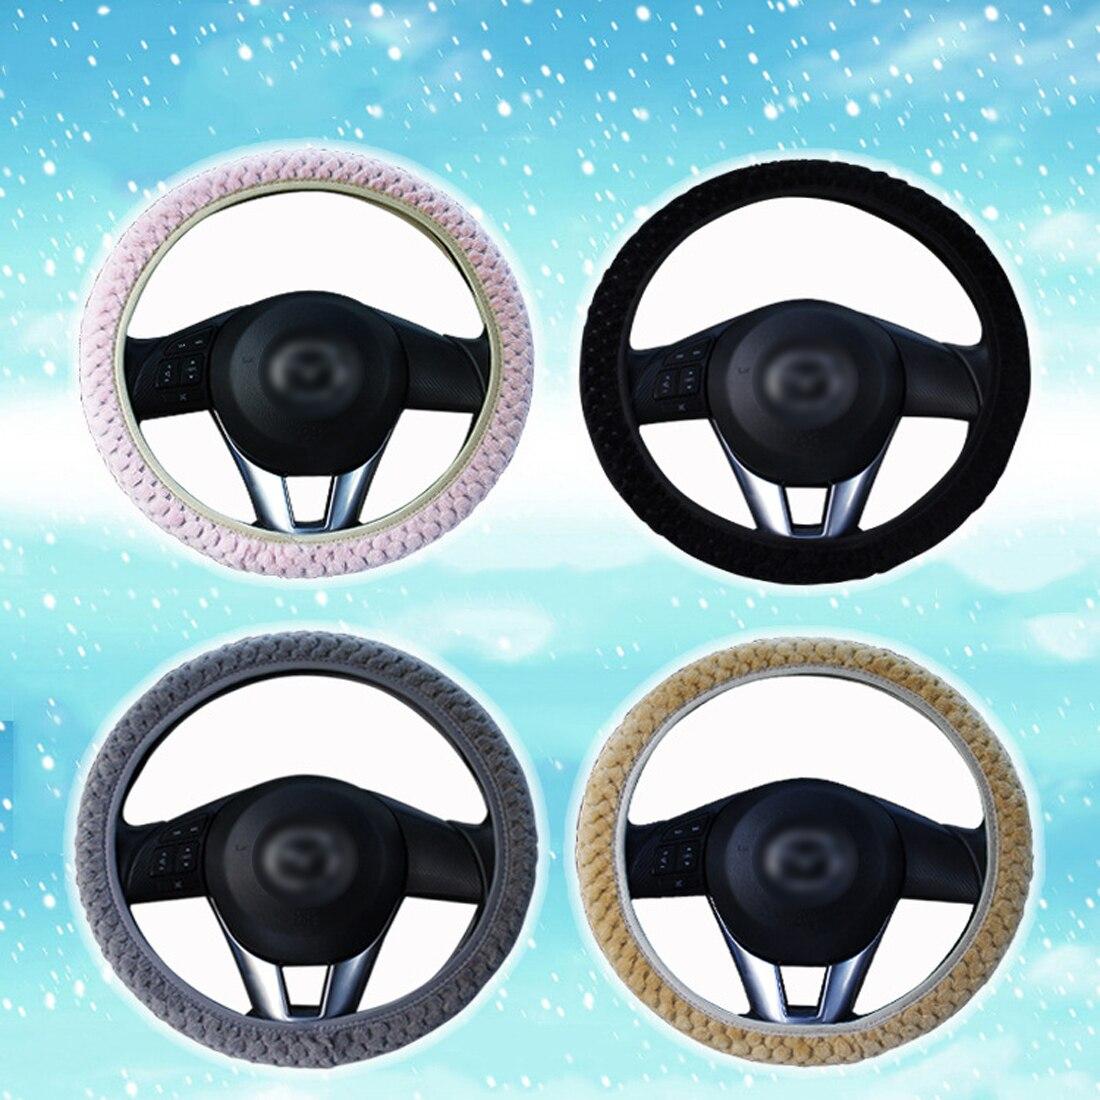 Dewtreetali New Pearl velvet Winter Car Steering Wheel Cover Universal Soft Warm Plush Covers for steering women car interior